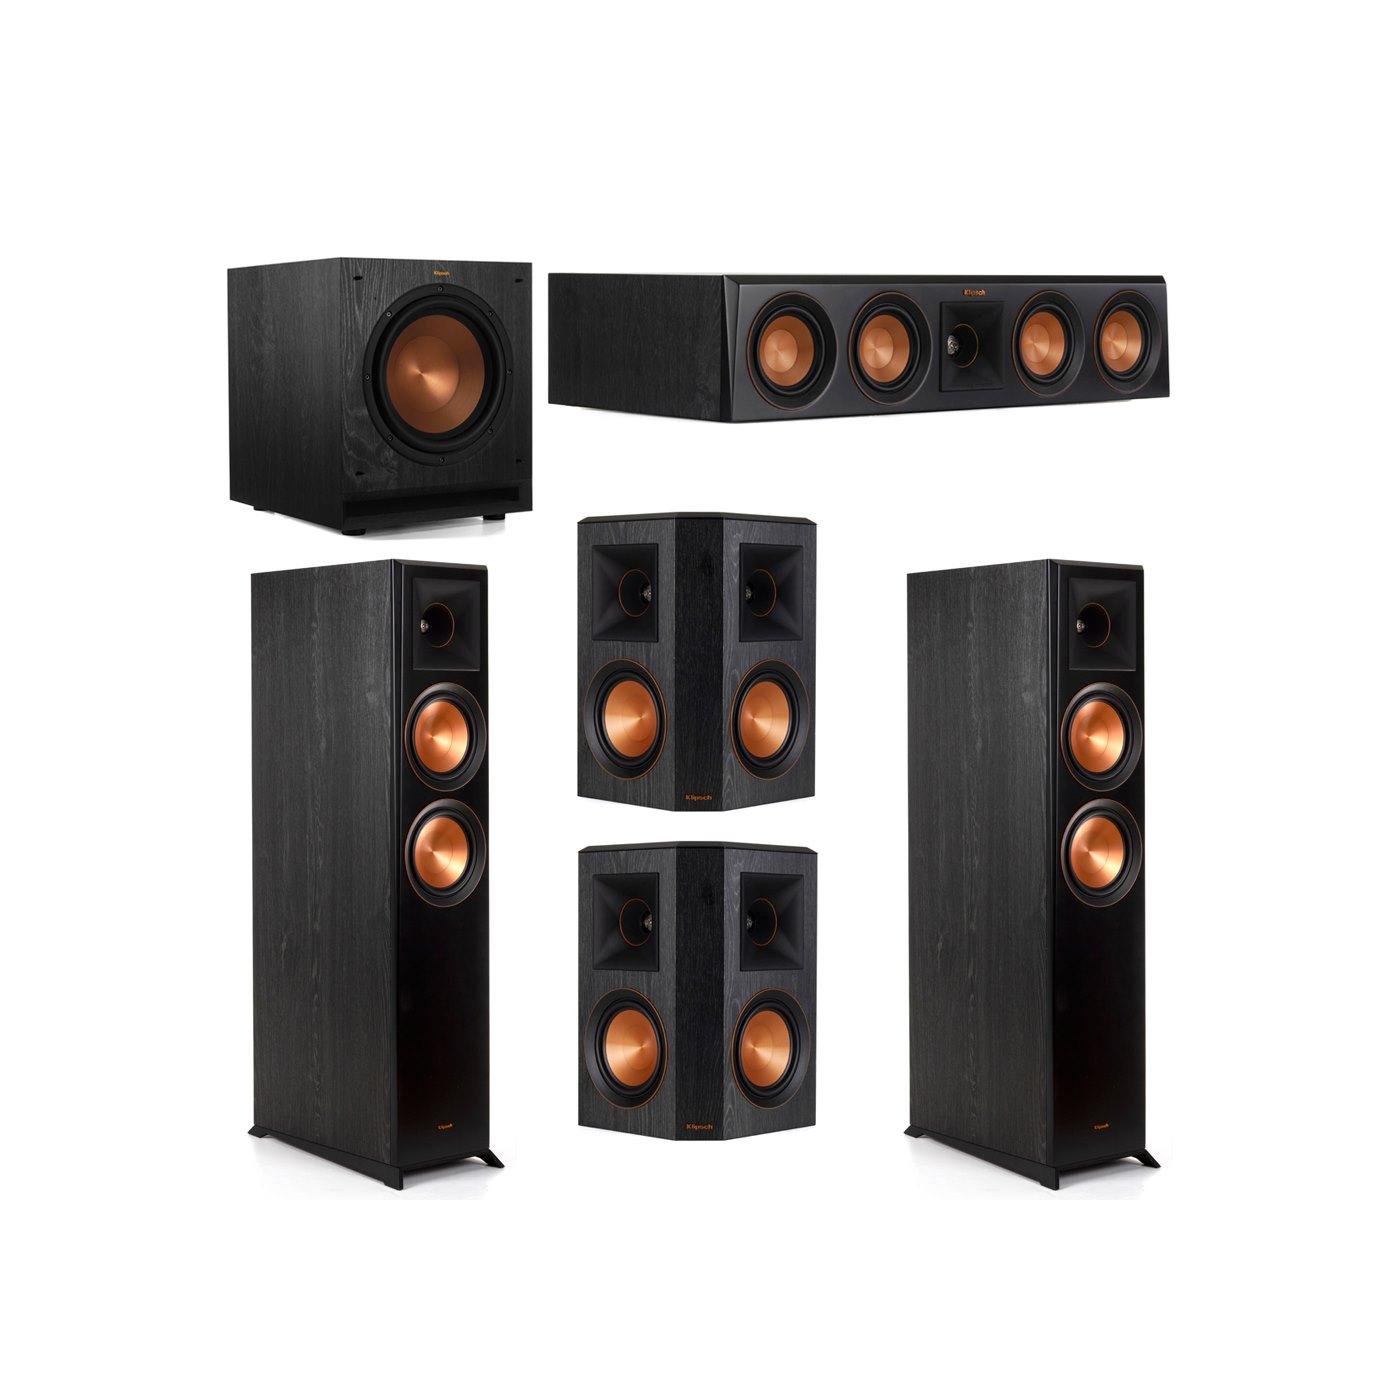 Klipsch 5.1 System with 2 RP-6000F Floorstanding Speakers, 1 Klipsch RP-404C Center Speaker, 2 Klipsch RP-502S Surround Speakers, 1 Klipsch SPL-100 Subwoofer